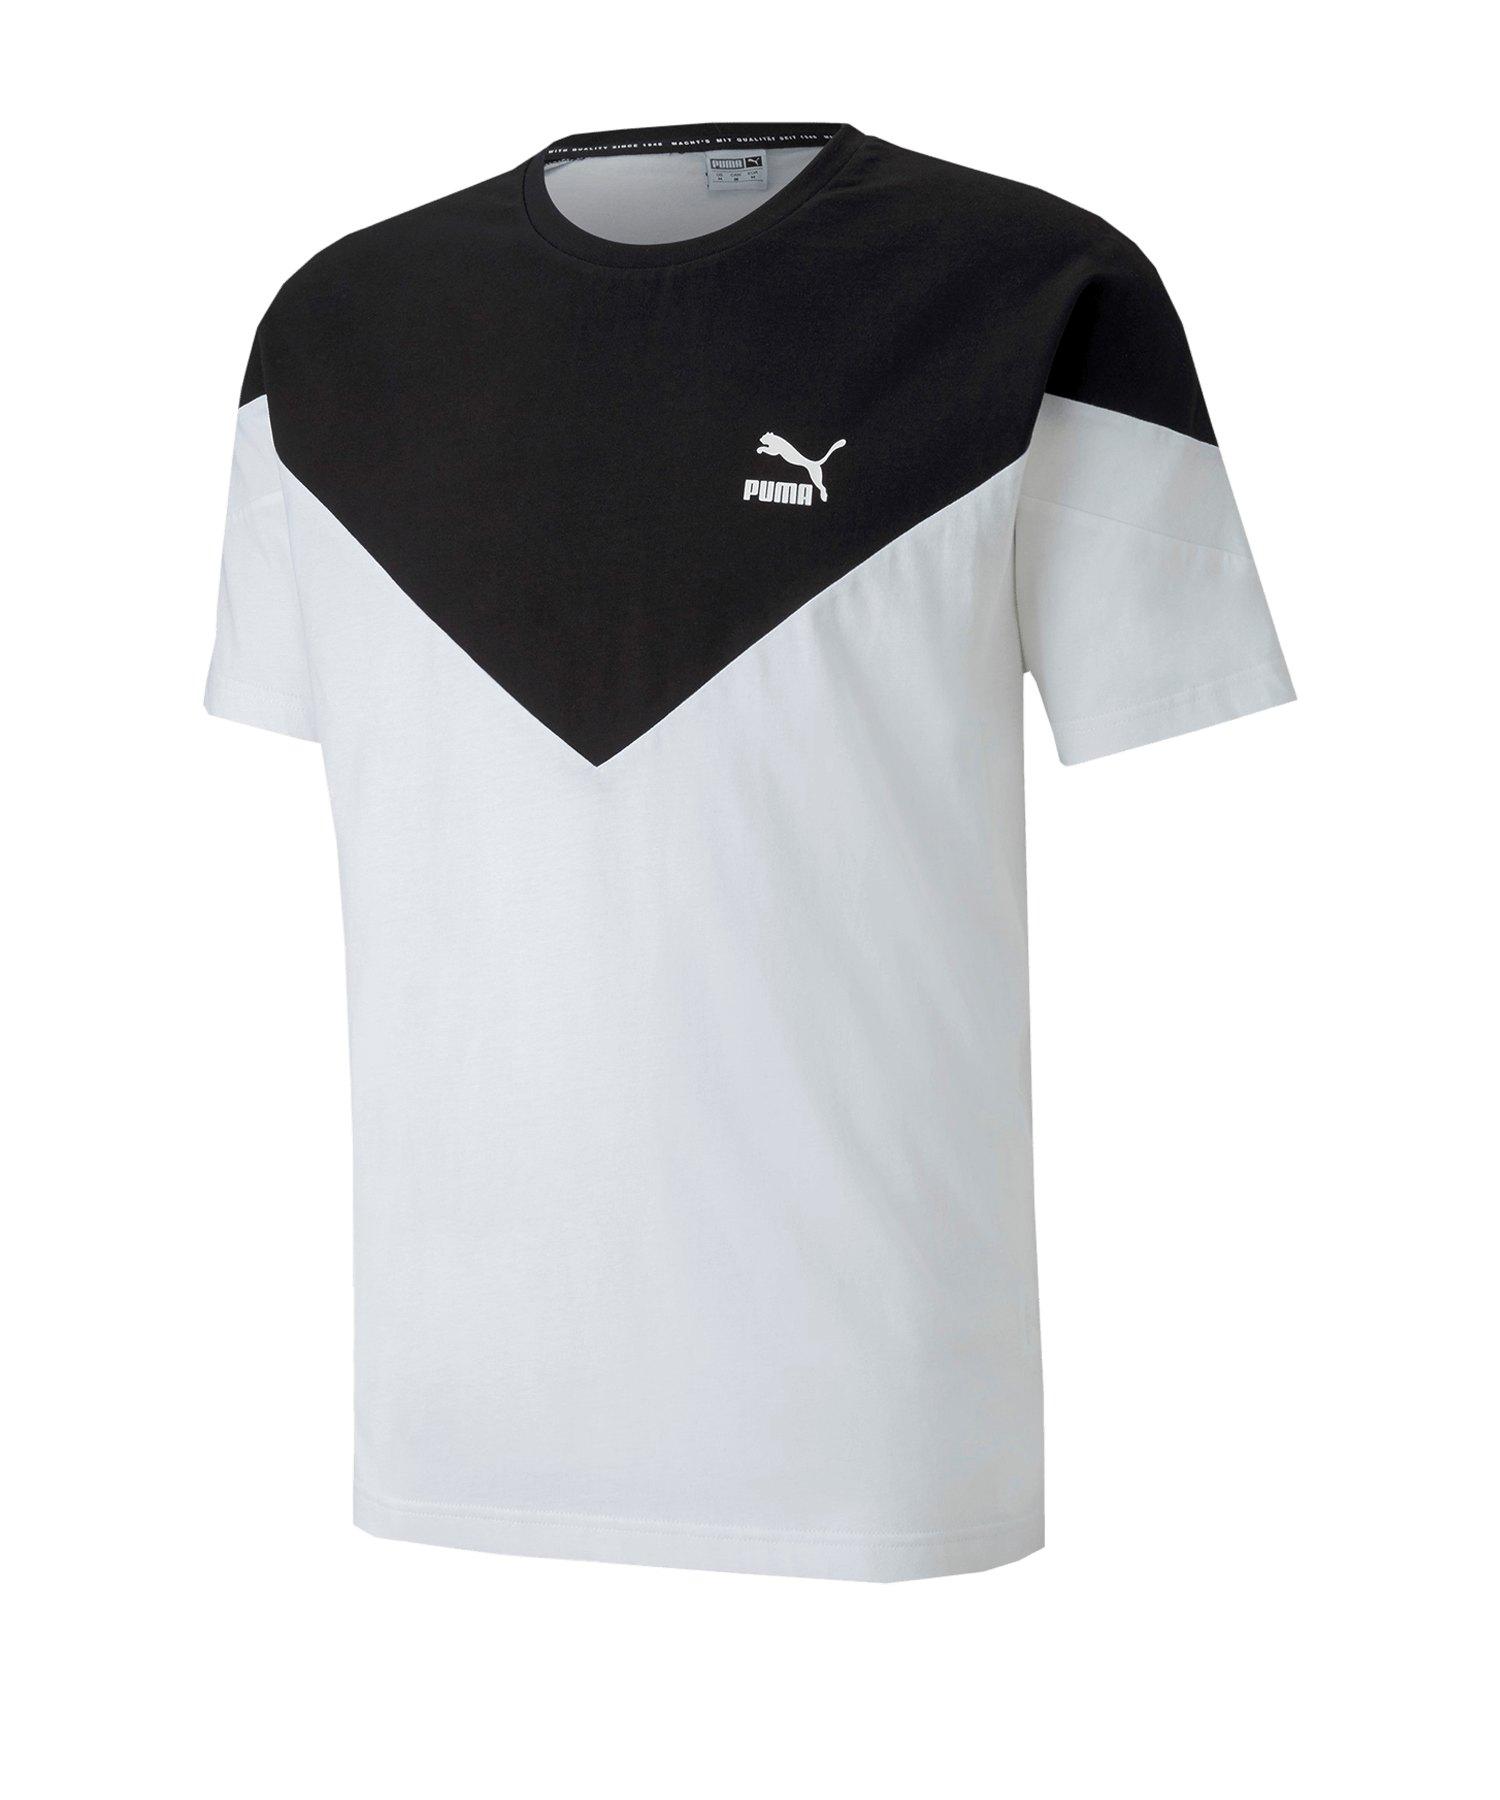 PUMA Iconic MCS T-Shirt Weiss F02 - weiss